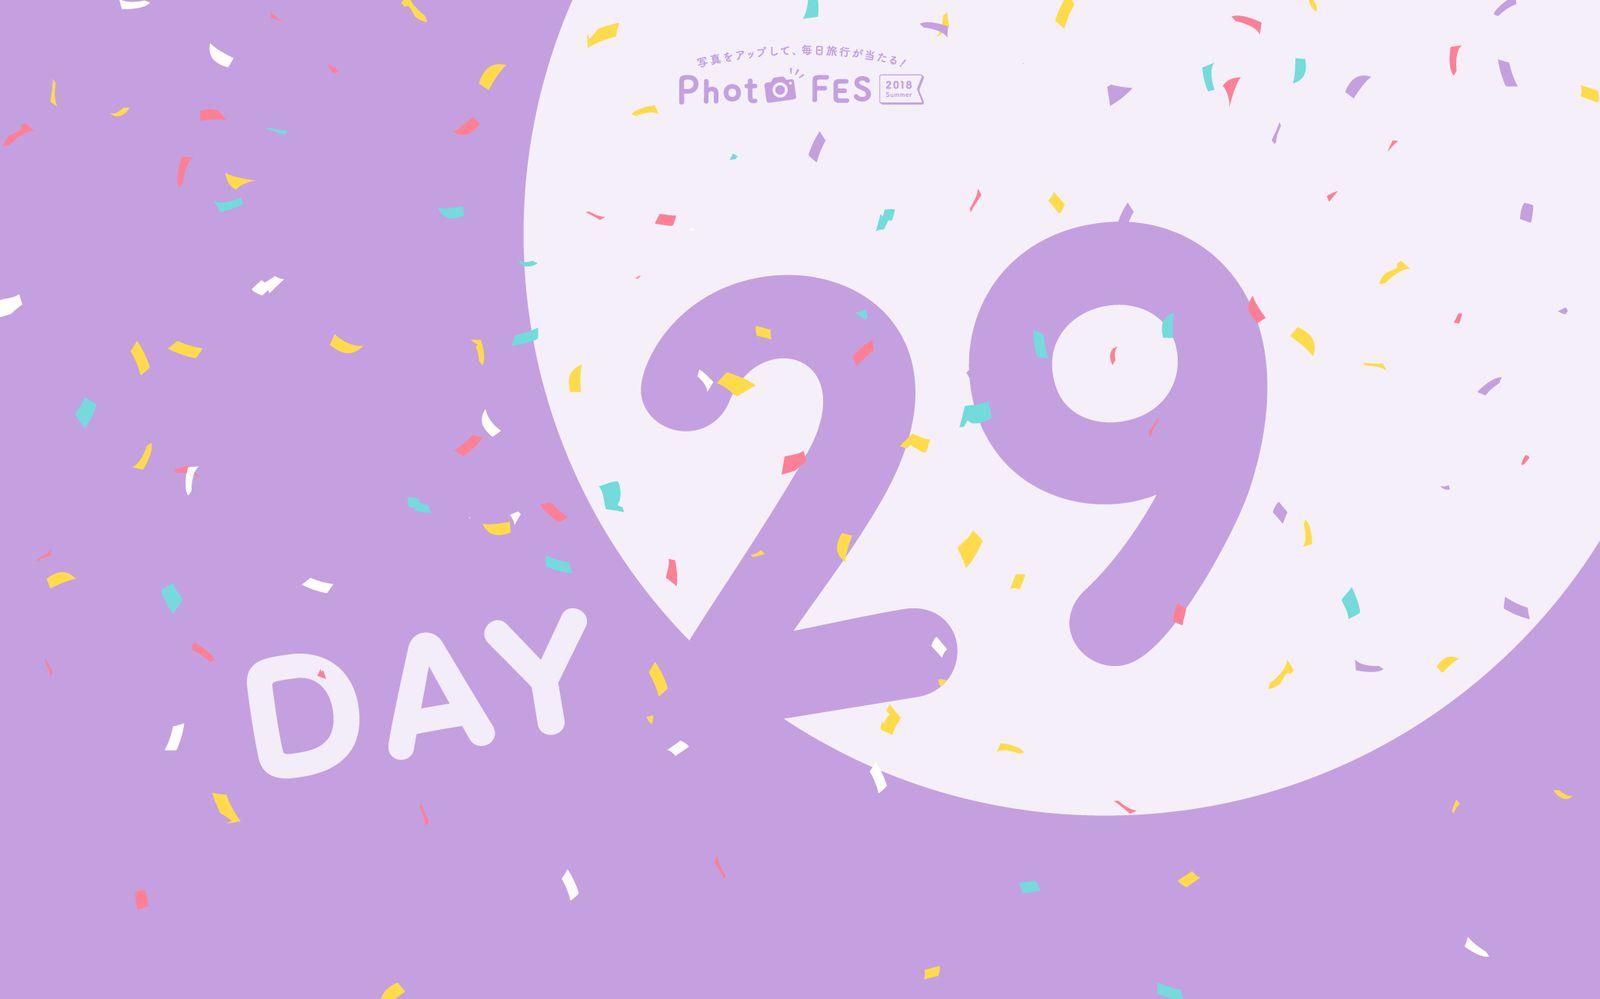 【DAY29】「Photo FES 2018」7月24日投稿分であたる賞品&受賞者発表